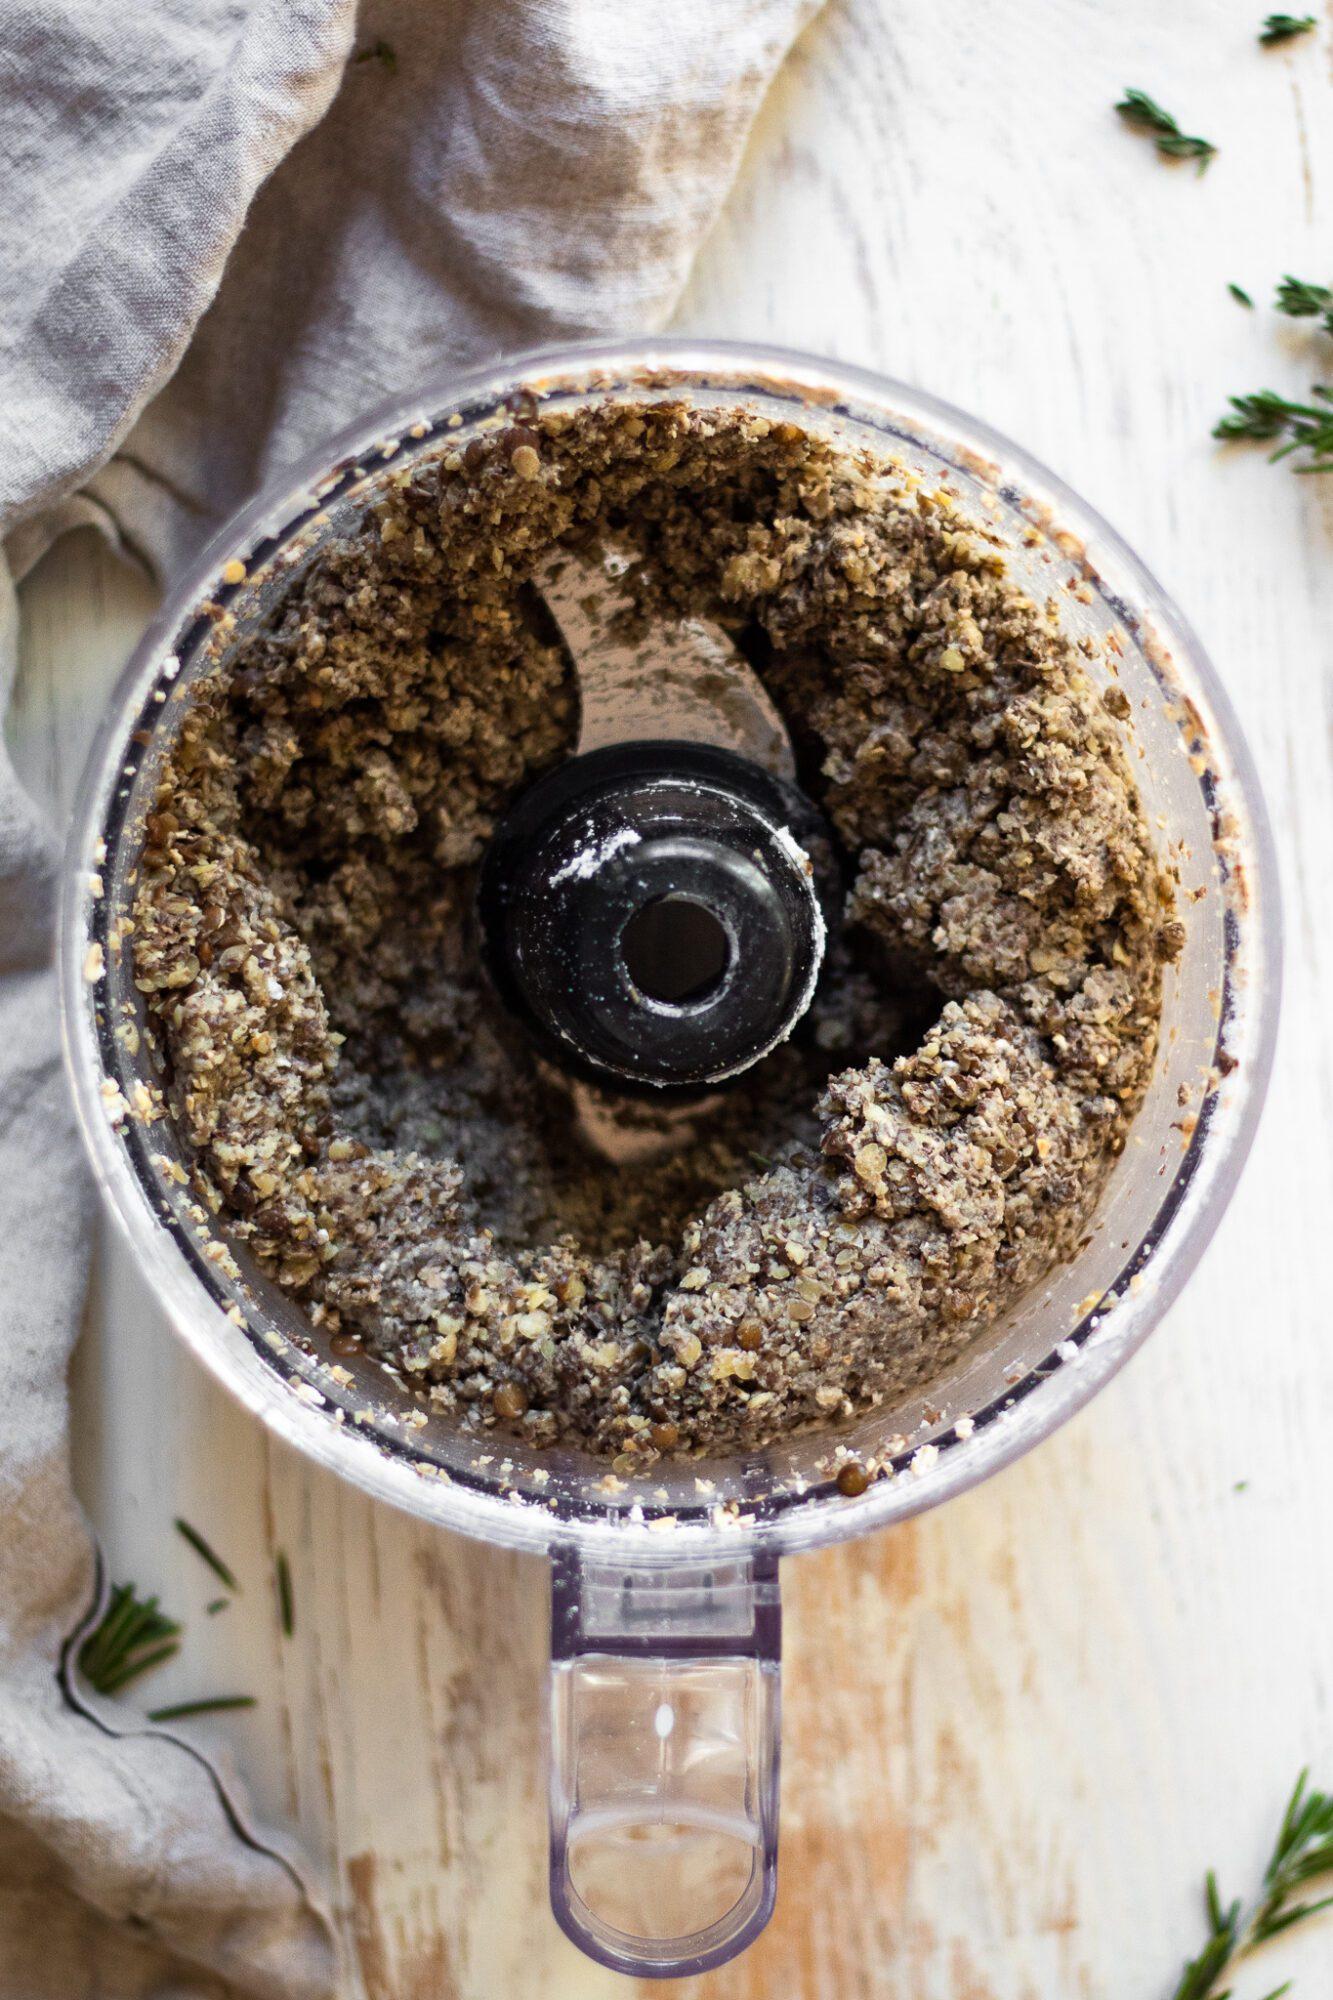 pureed lentils in food processor